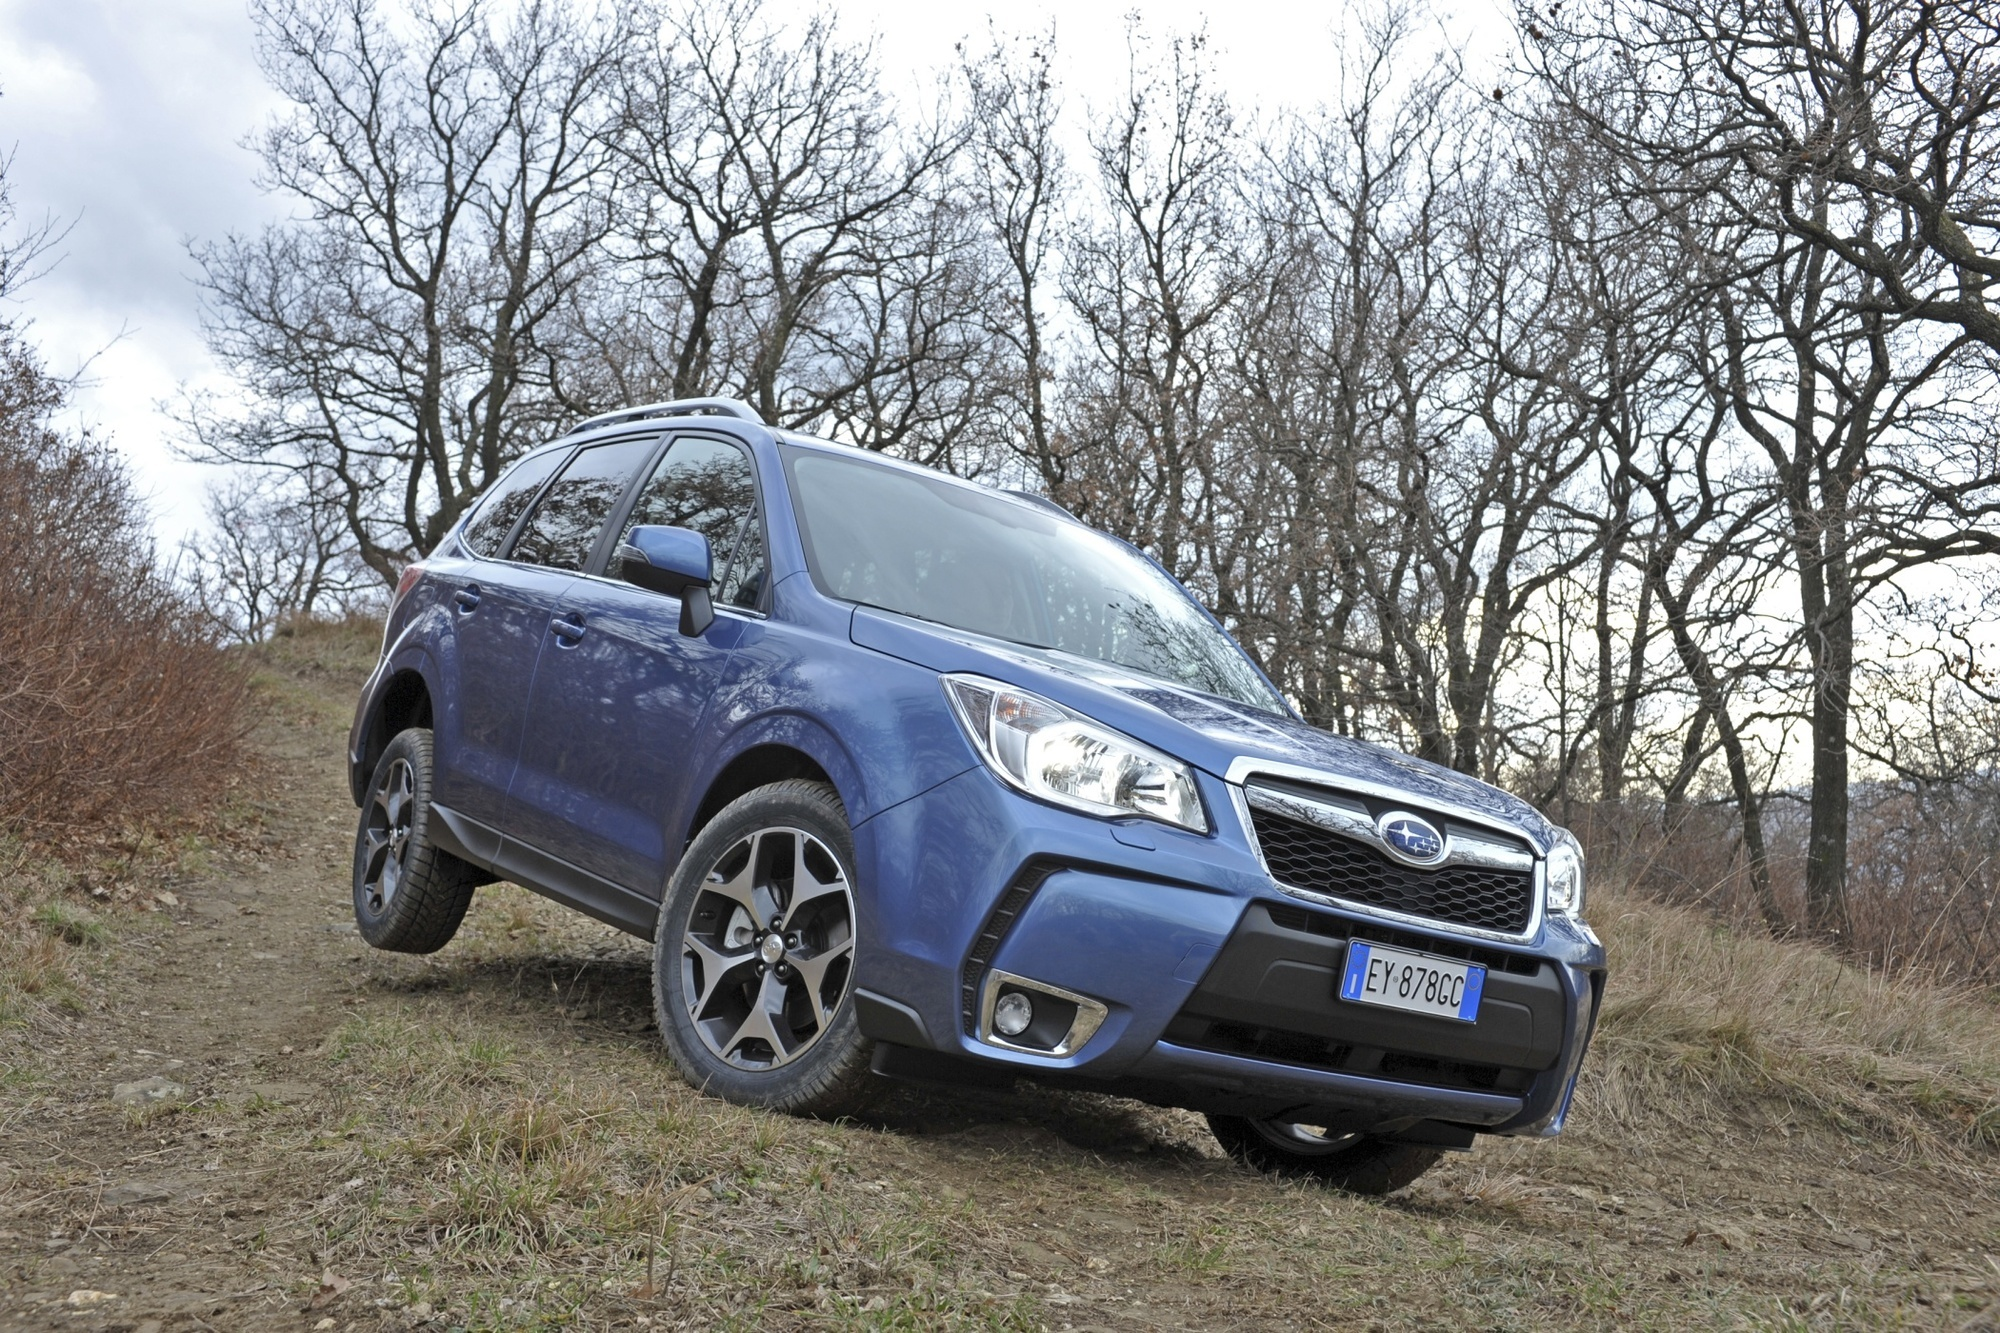 Fahrbericht: Subaru Forester 2.0 D Automatik - Waldläufer an der Laschenkette